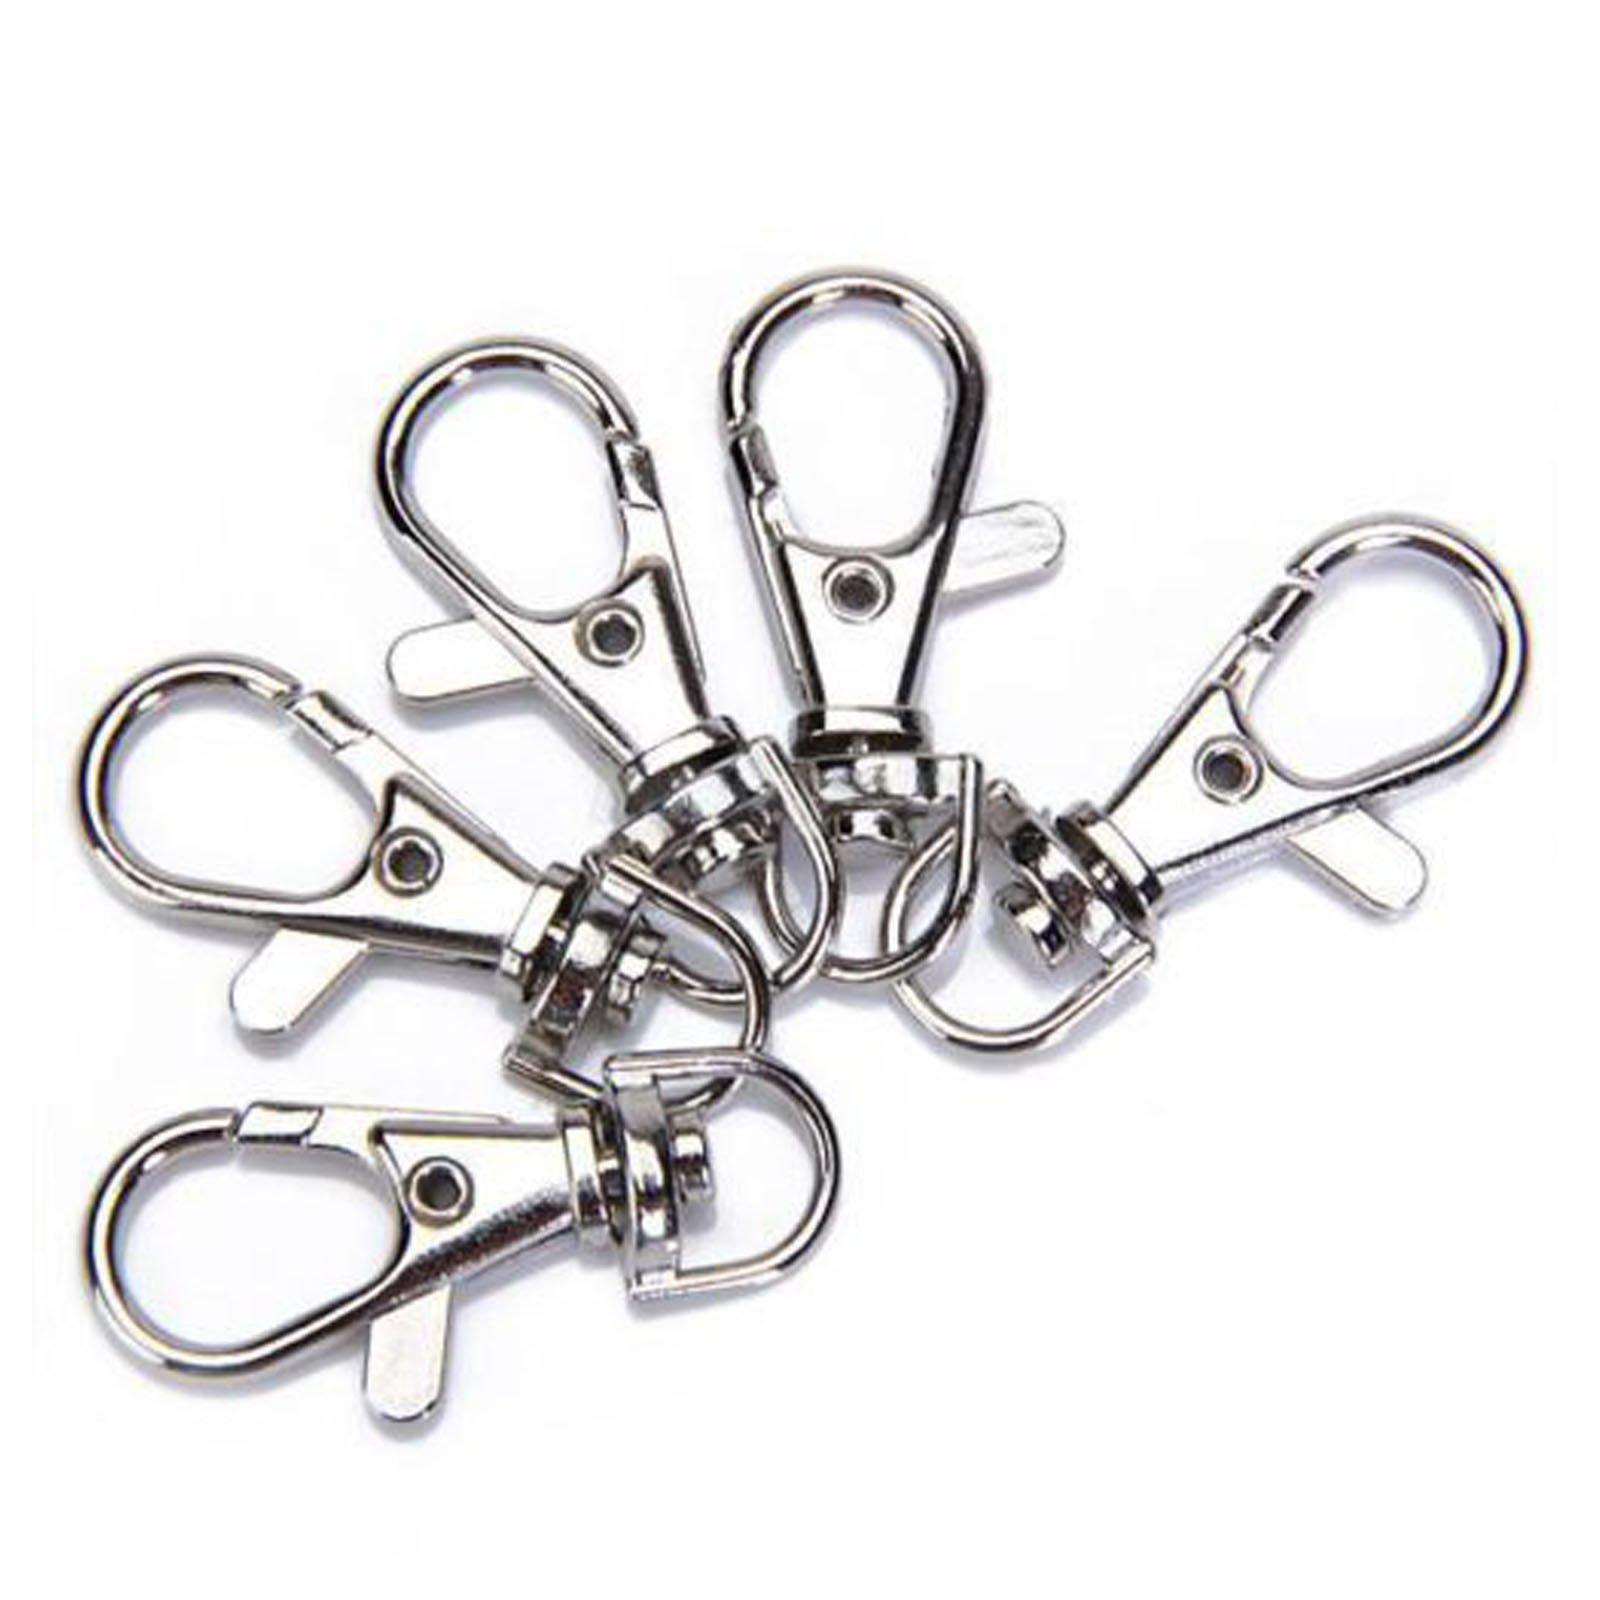 #10PCS - 5/10pcs Silver Swivel Trigger Clips Snap Lobster Clasp Hook Bag Key Ring Making